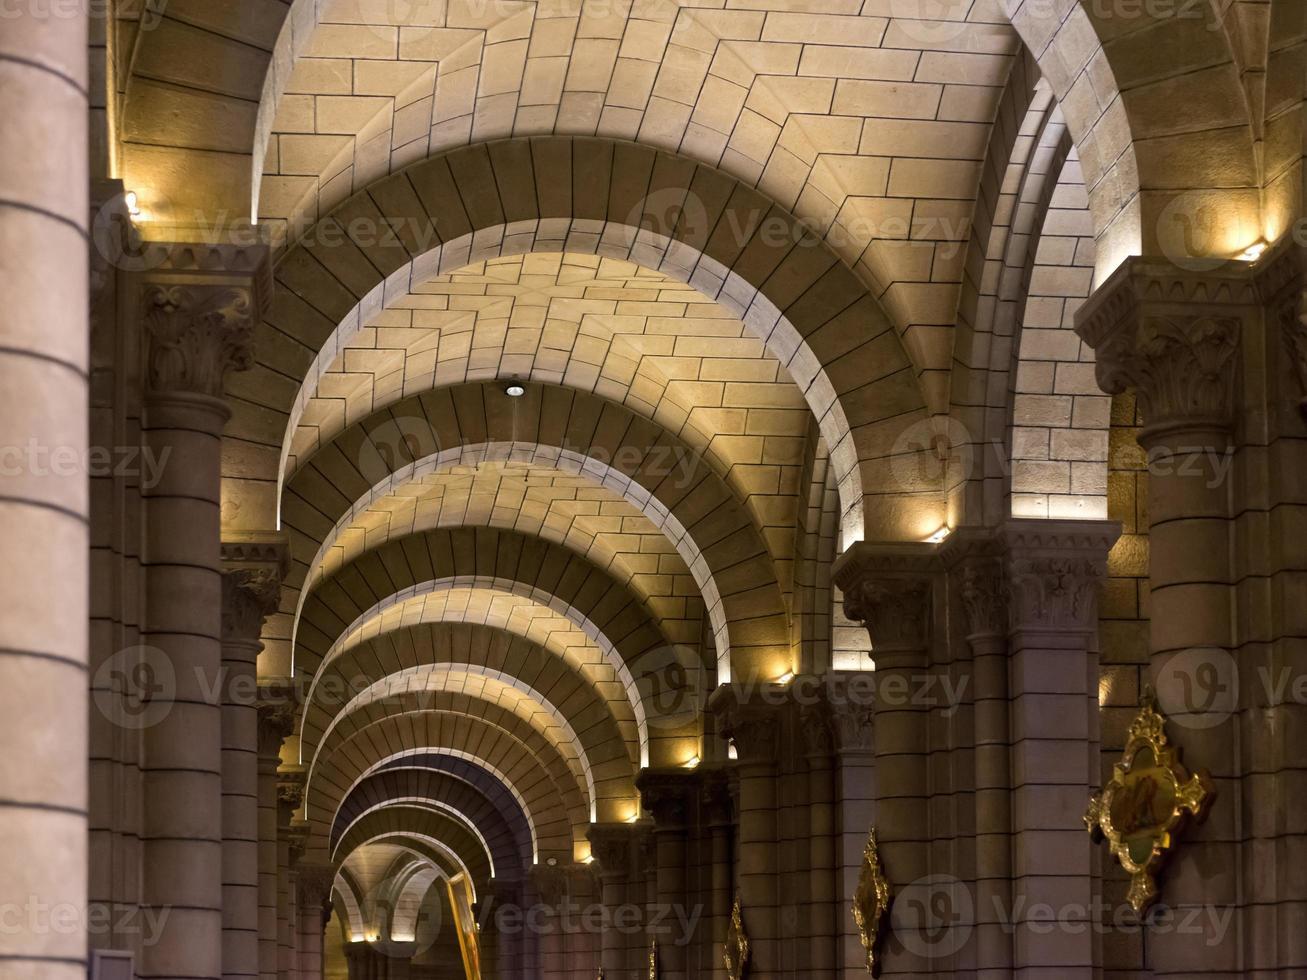 pasillo de la catedral de mónaco foto